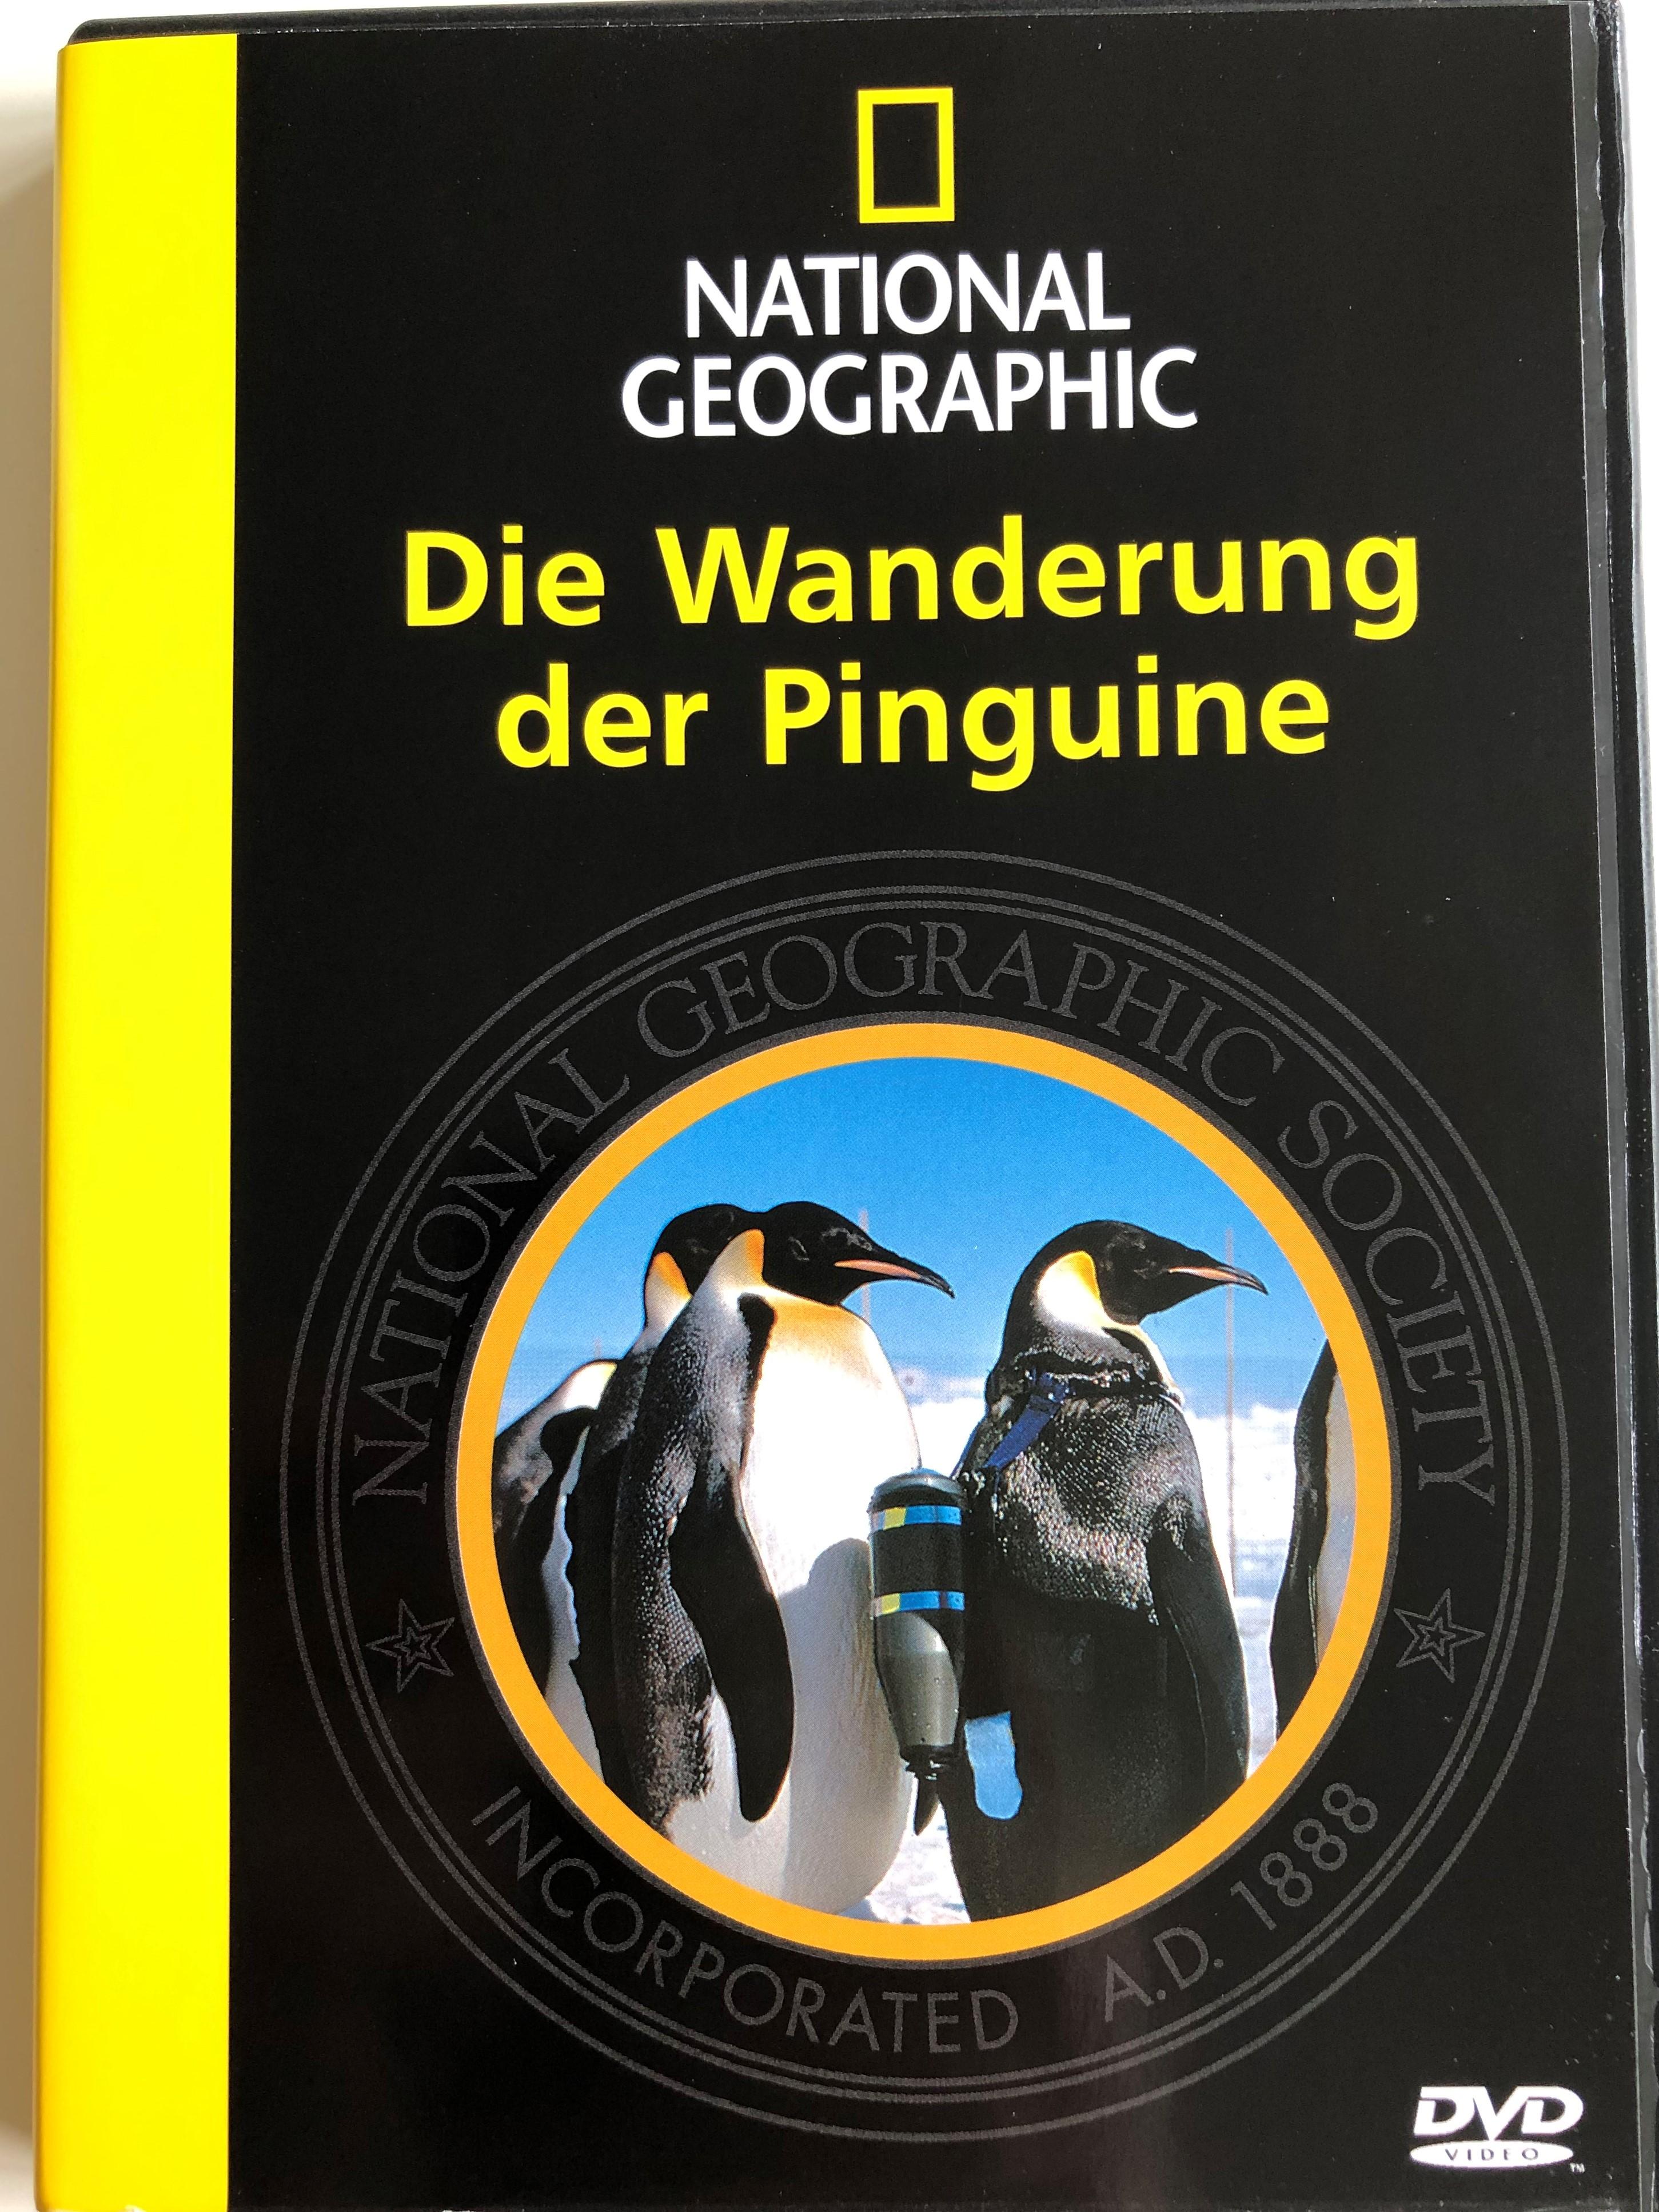 die-wanderung-der-pinguine-dvd-2004-migration-of-the-penguins-national-geographic-1-.jpg